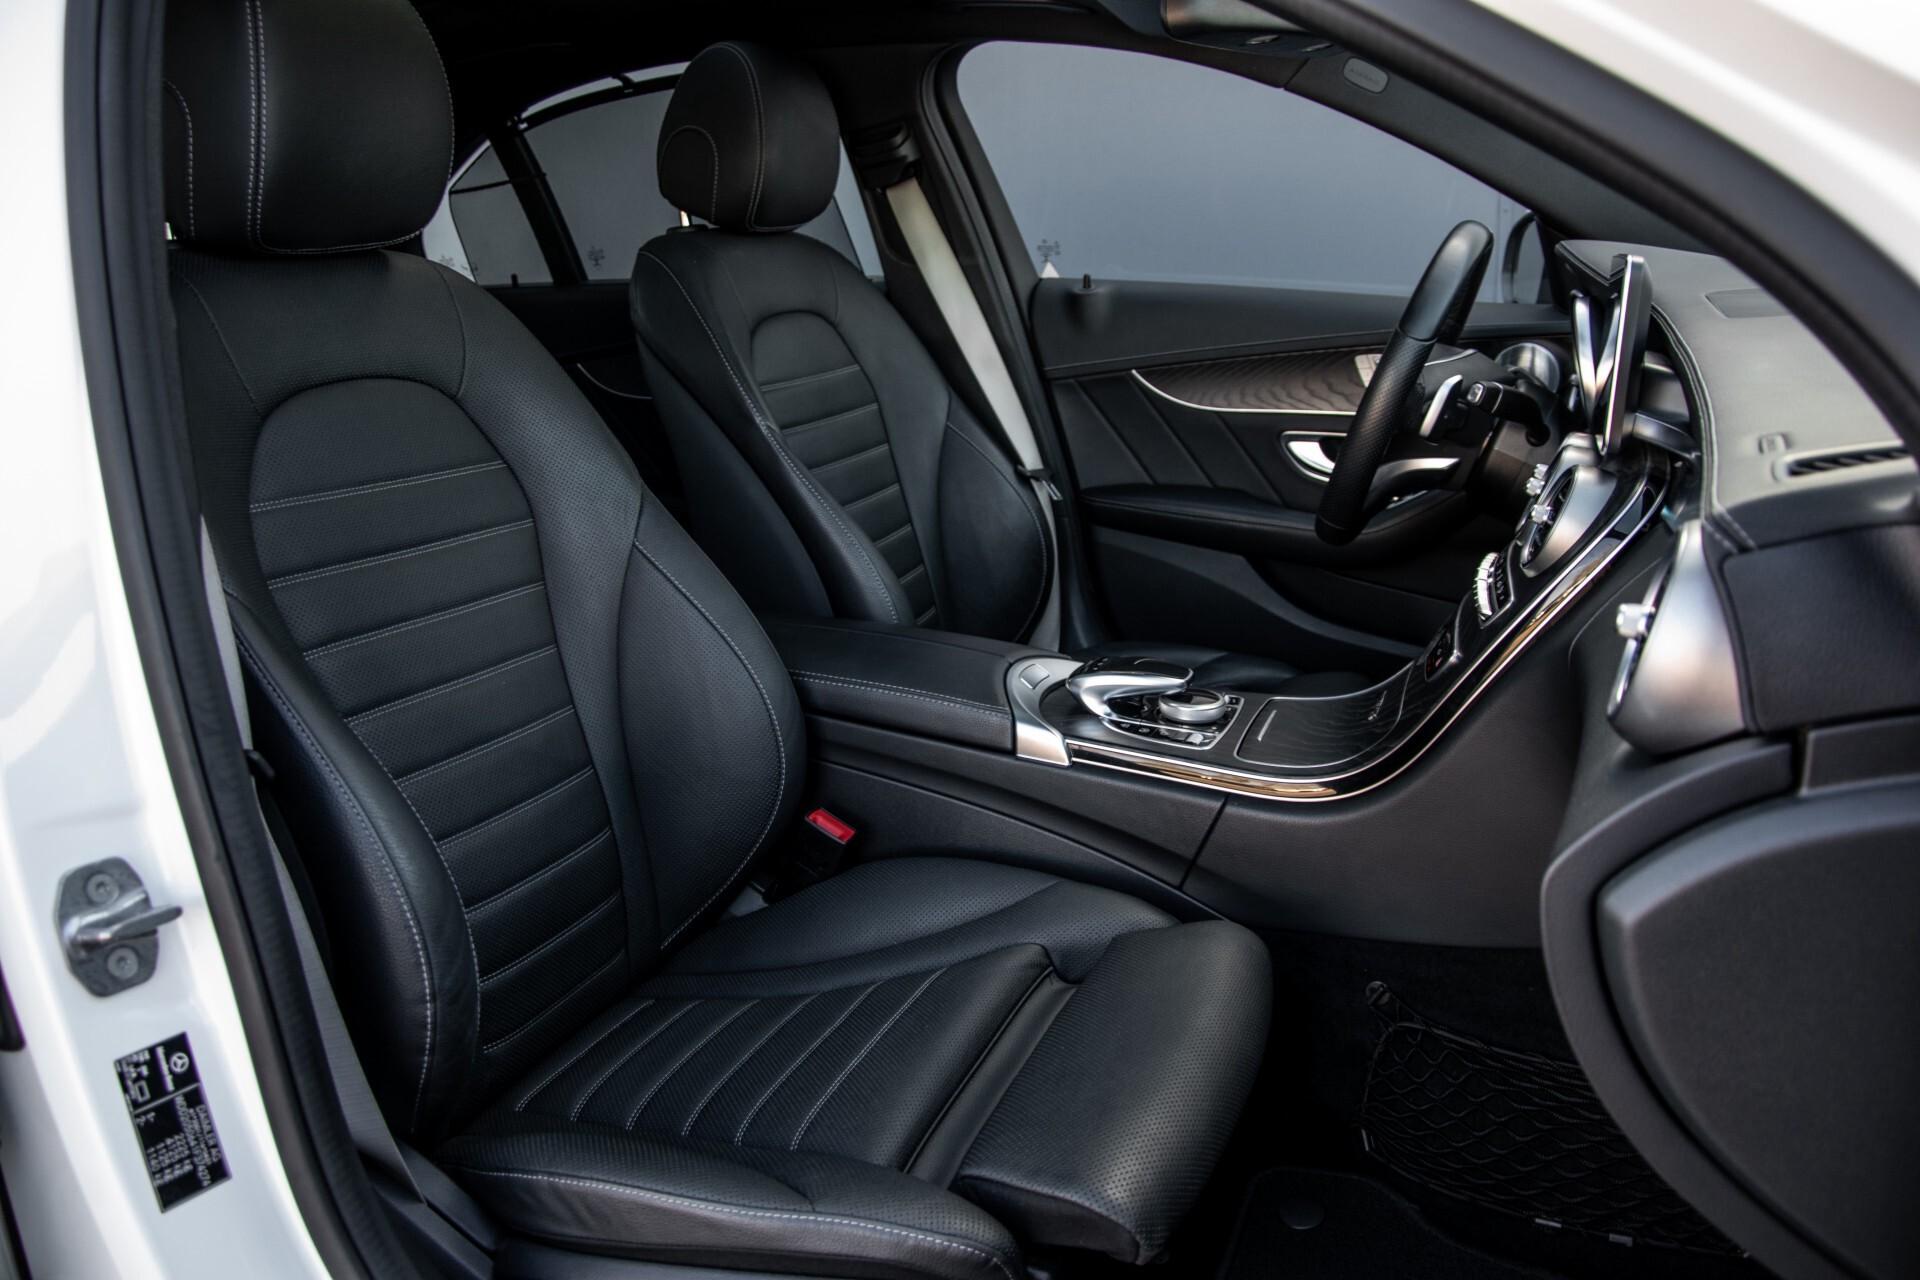 Mercedes-Benz C-Klasse 450/43 AMG 4-M Distronic/Standkachel/Panorama/Keyless/Harman-Kardon/Stoelkoeling Aut7 Foto 3